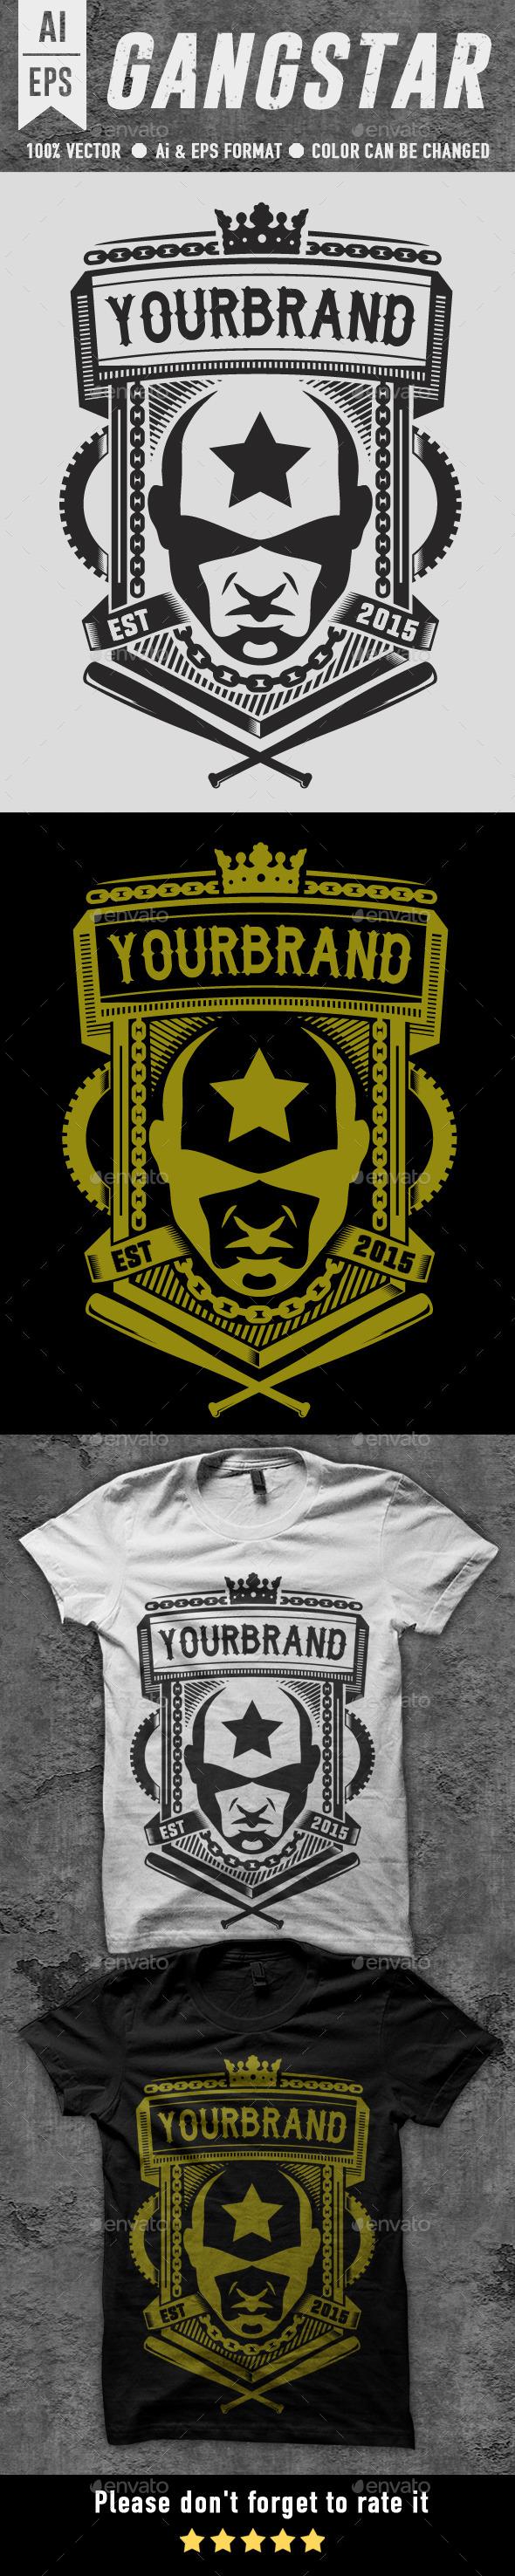 GraphicRiver Gangstar T-shirt Design 10398299